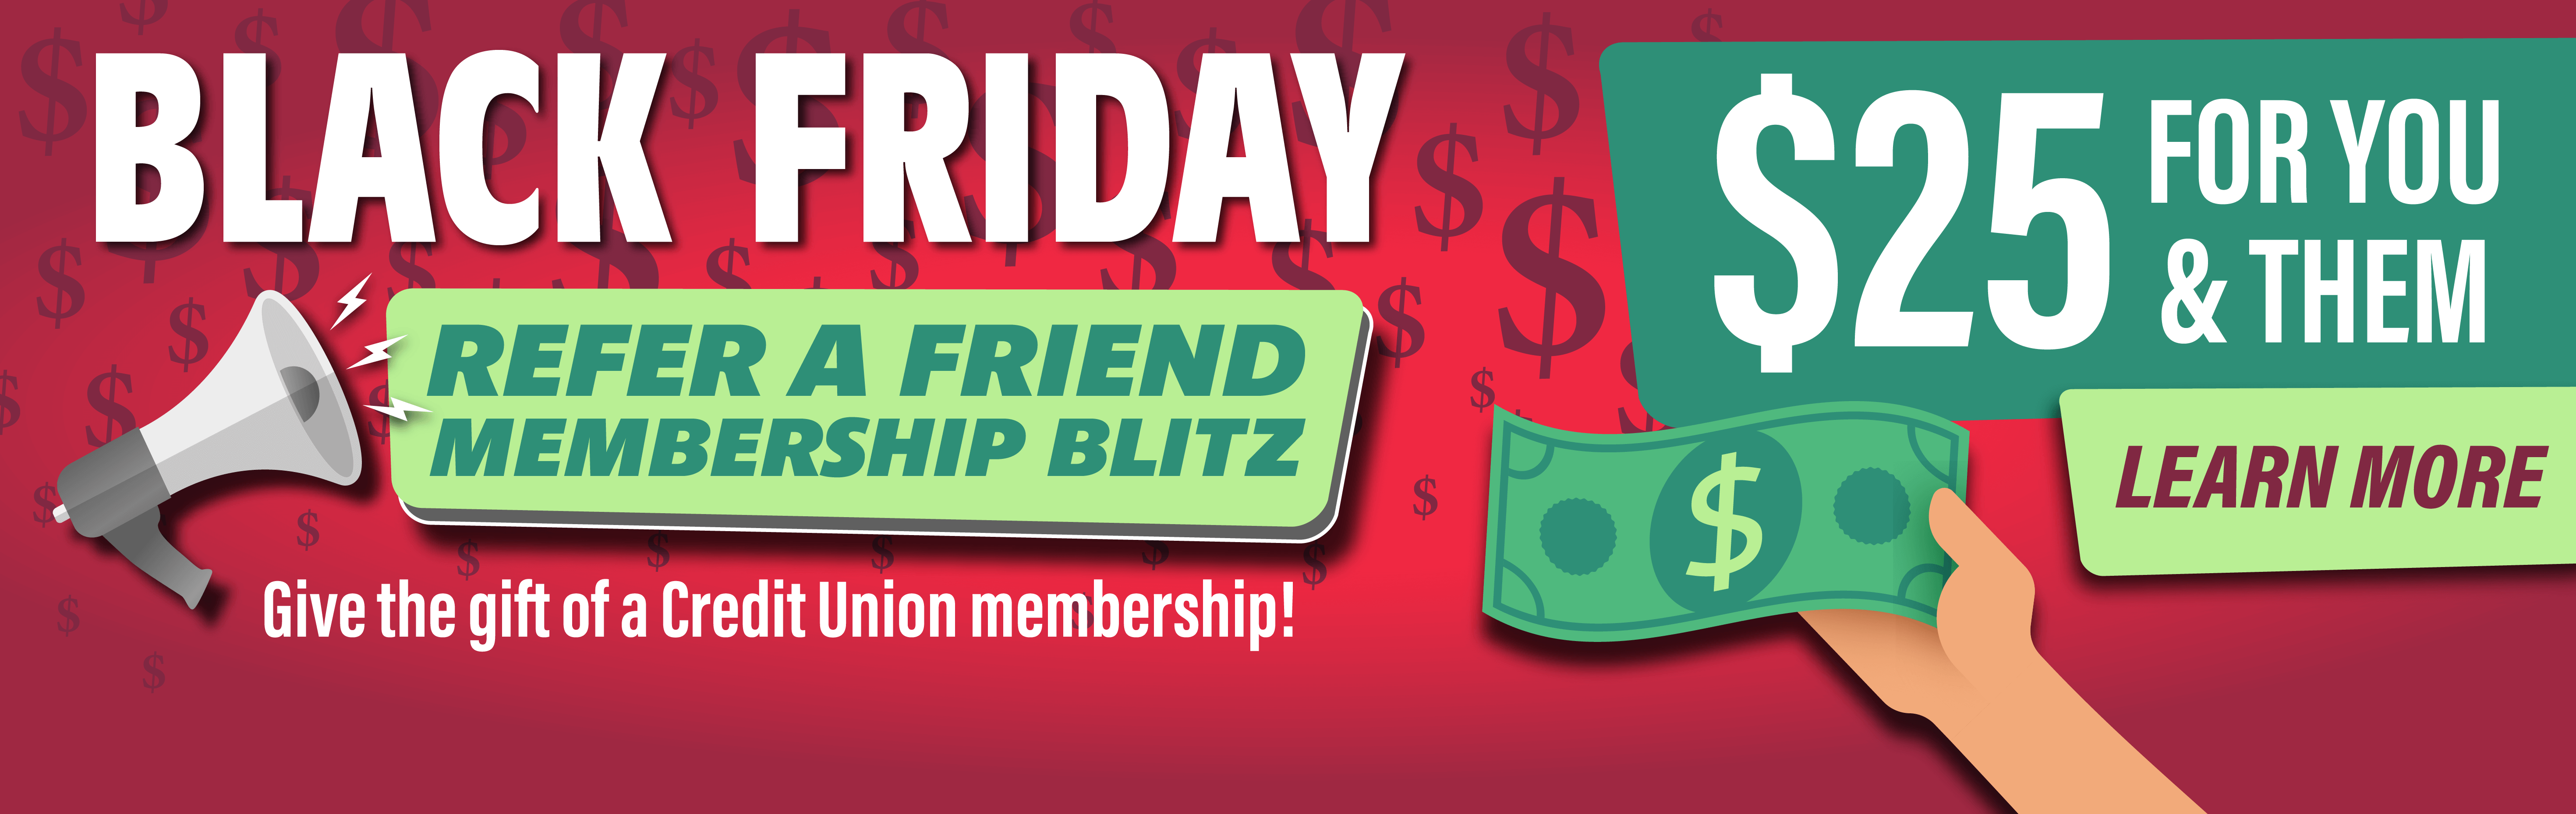 Black Friday Membership Blitz